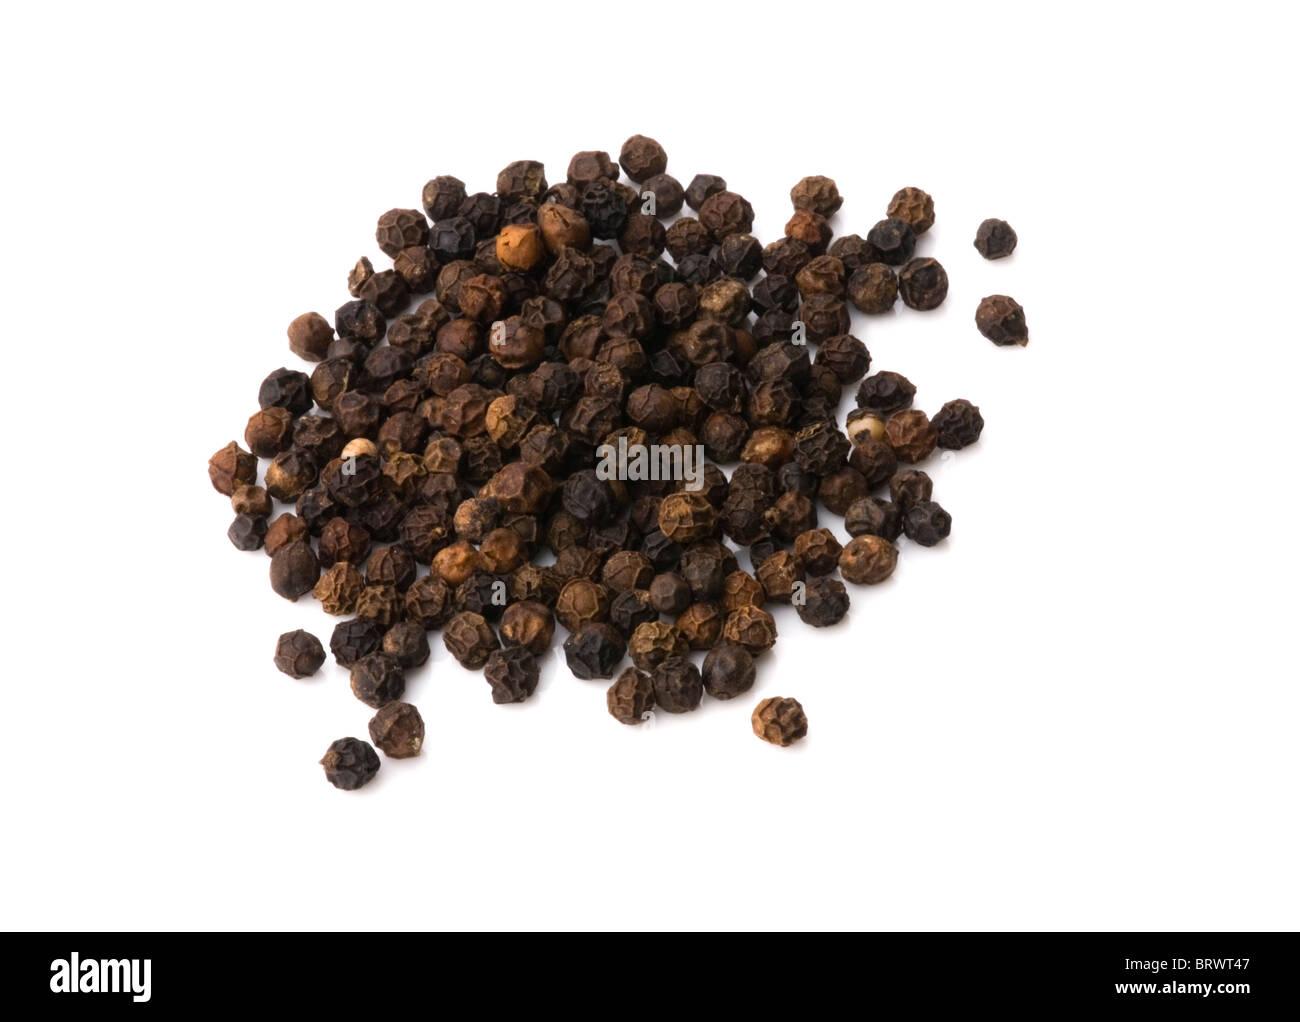 Black Peppercorns. - Stock Image